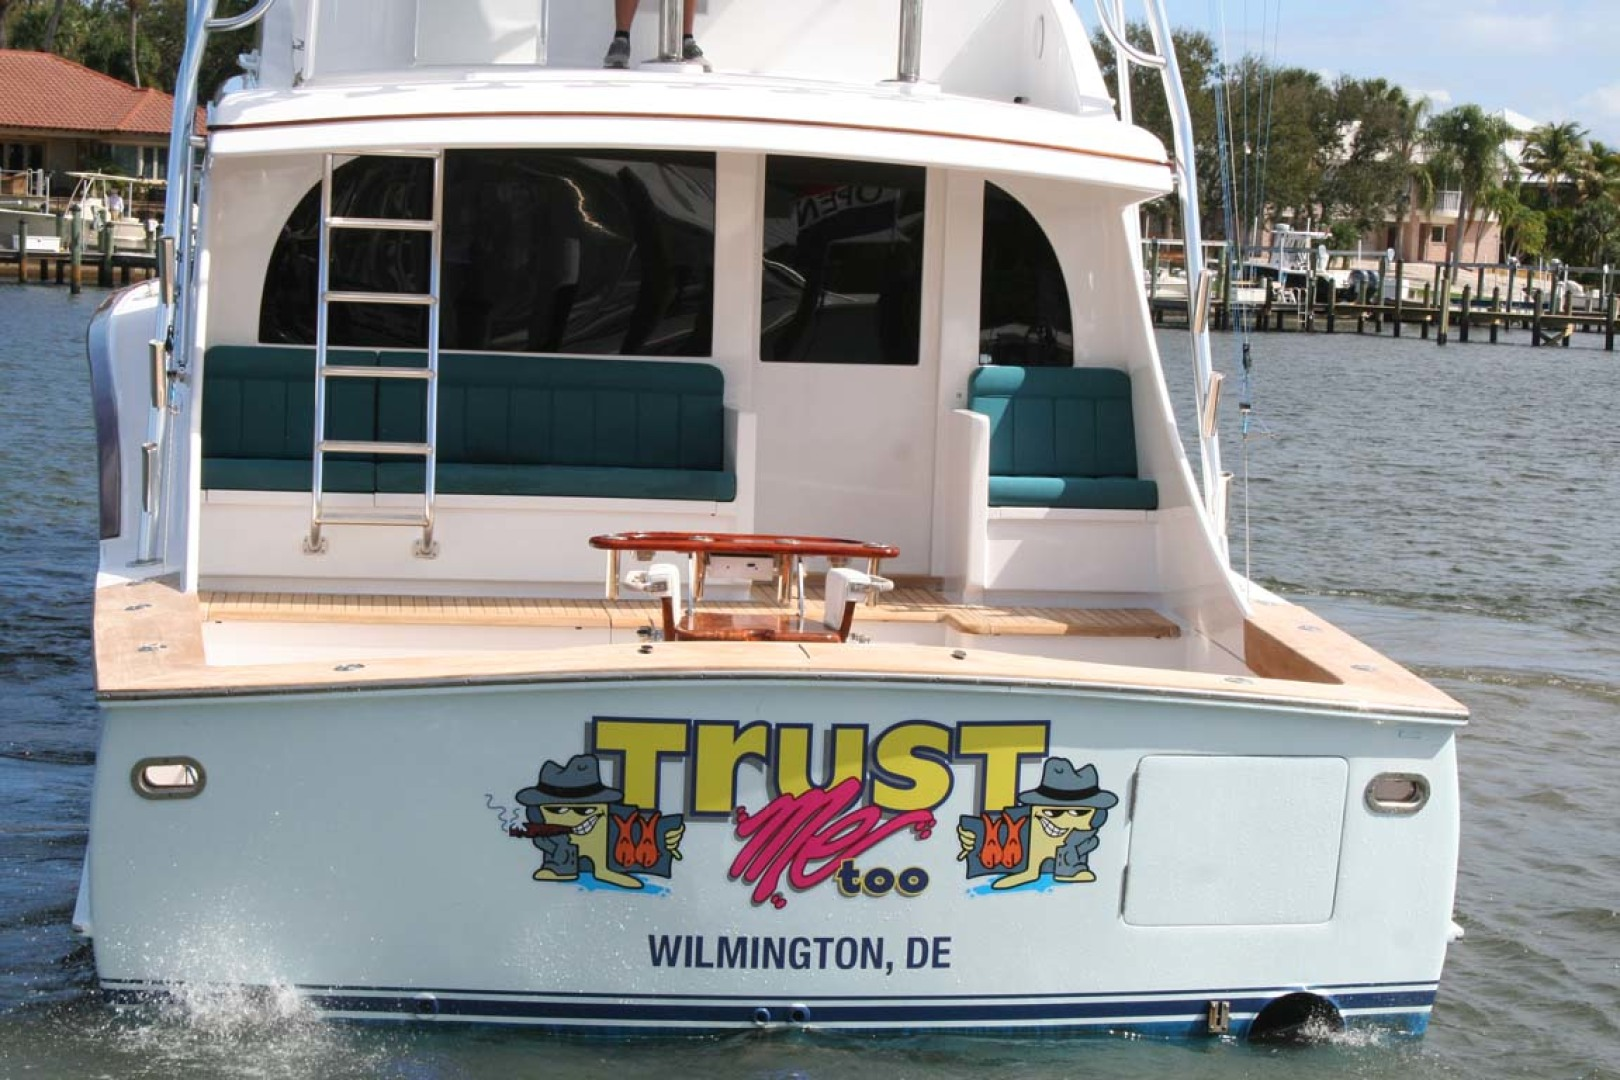 Titan-62 Custom Carolina Sportfish 2004-Trust Me Too Stuart-Florida-United States-Stern View-1118272 | Thumbnail